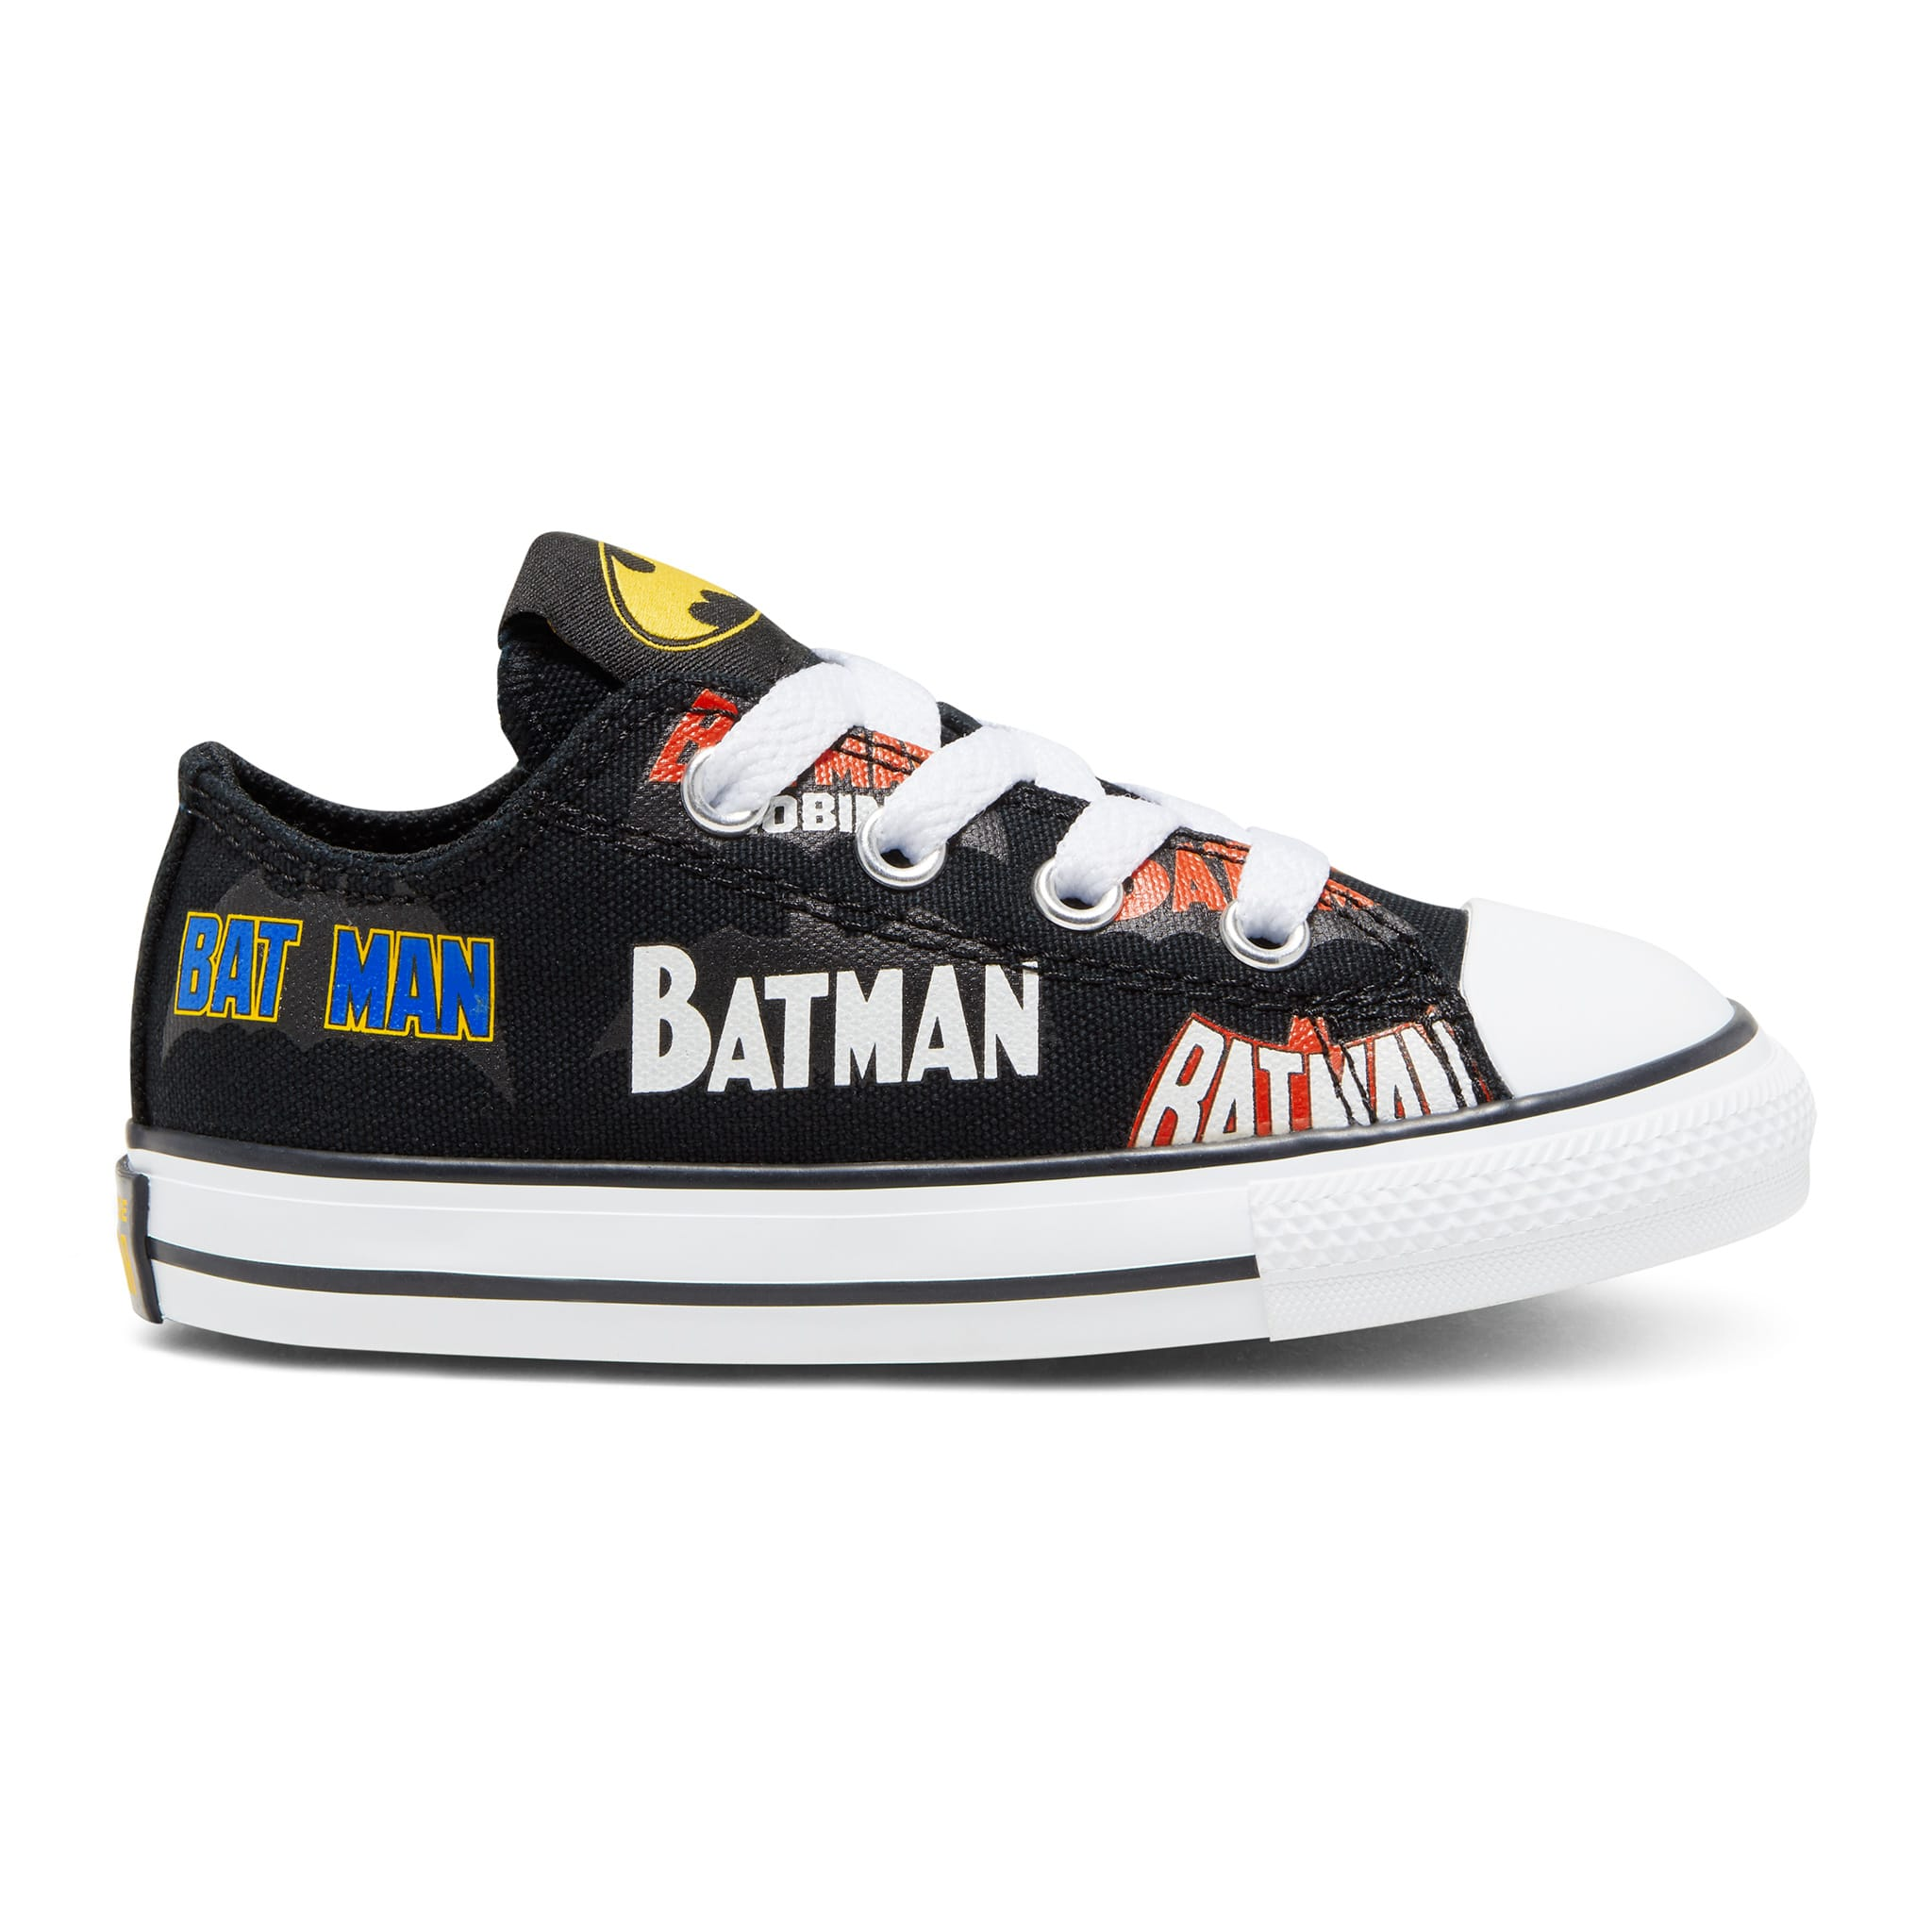 Converse Batman Chuck Taylor All Star Low Top Size 4 10 Clement